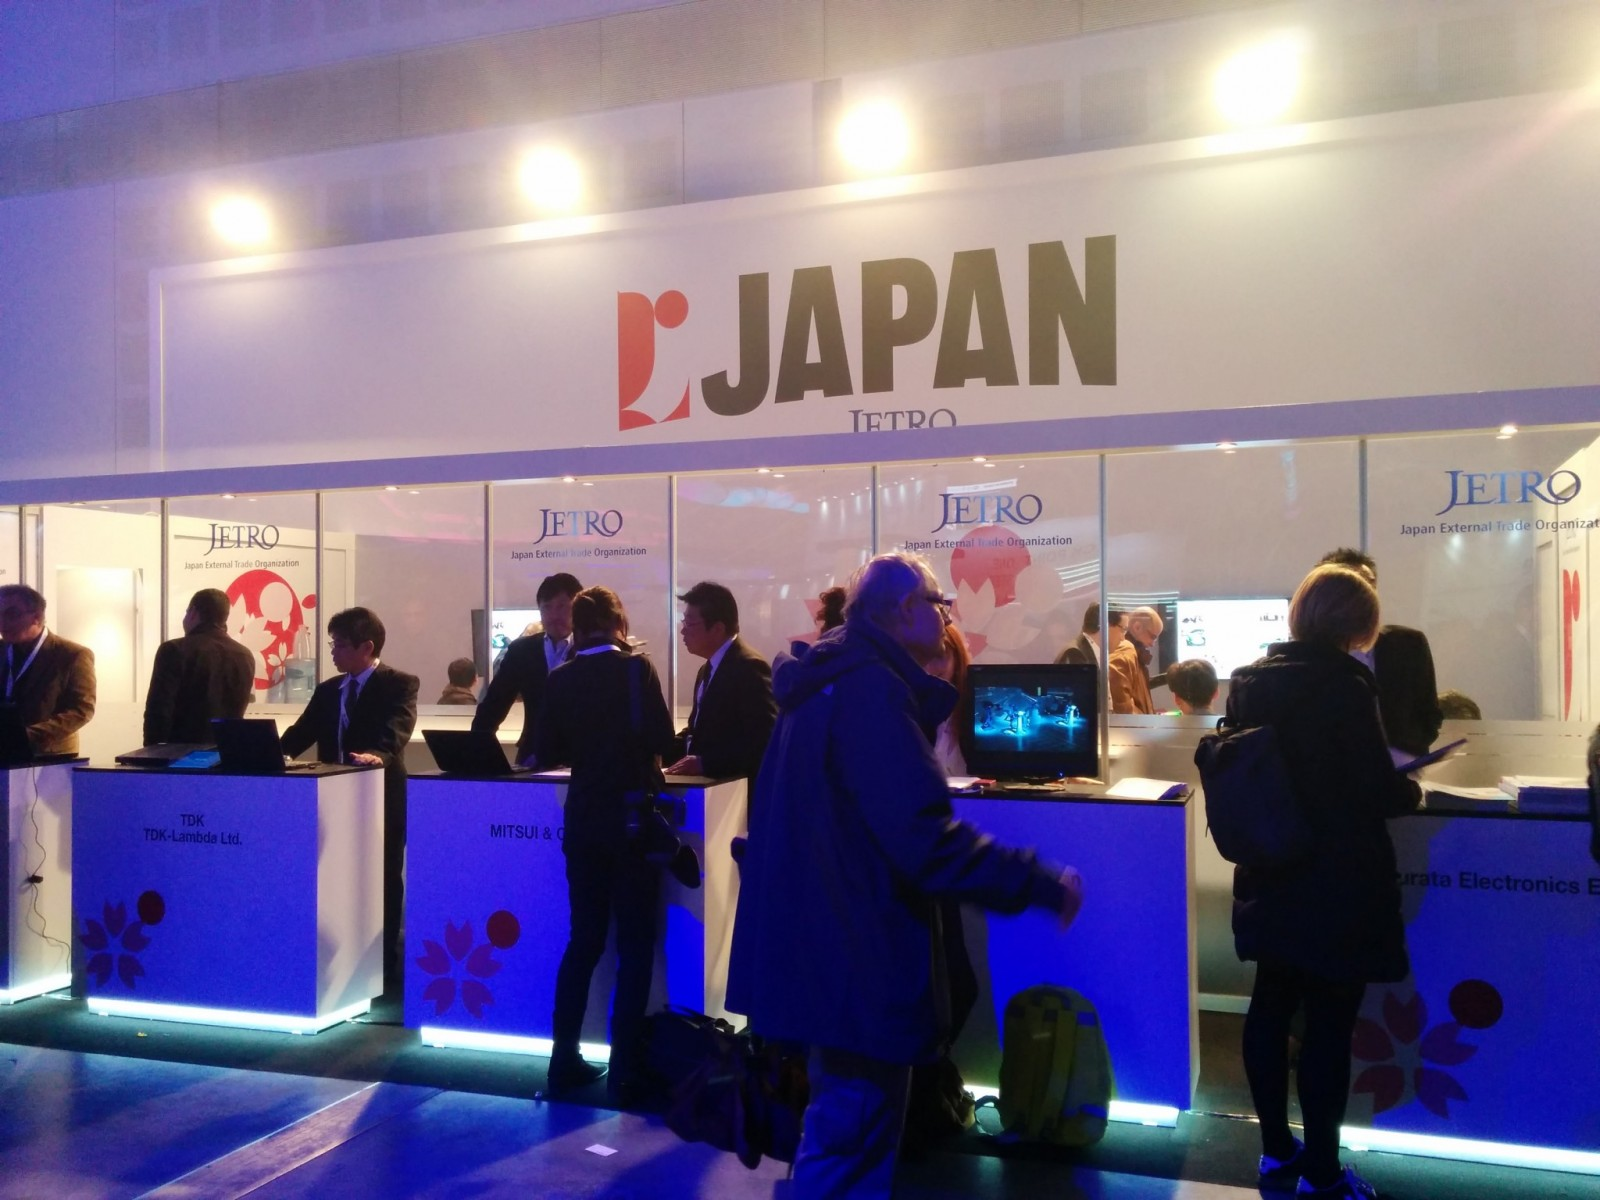 Japan sent a large delegation to Cybertech 2016. Photo by Viva Sarah Press